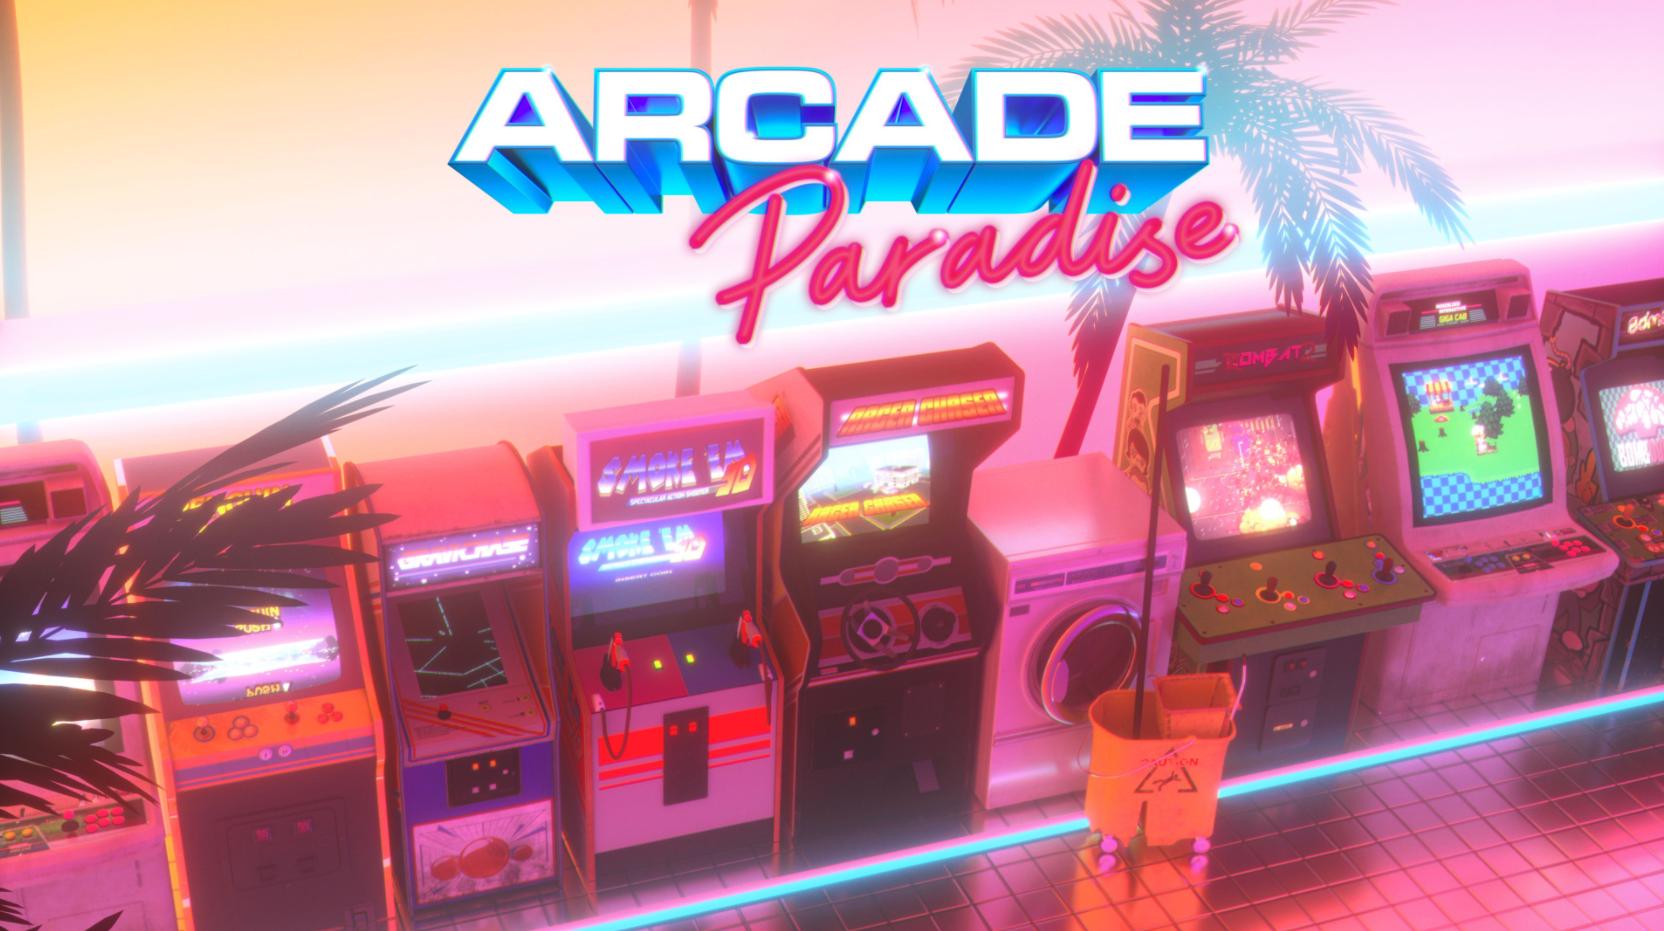 arcade-paradise-ps5-ps4-news-reviews-videos